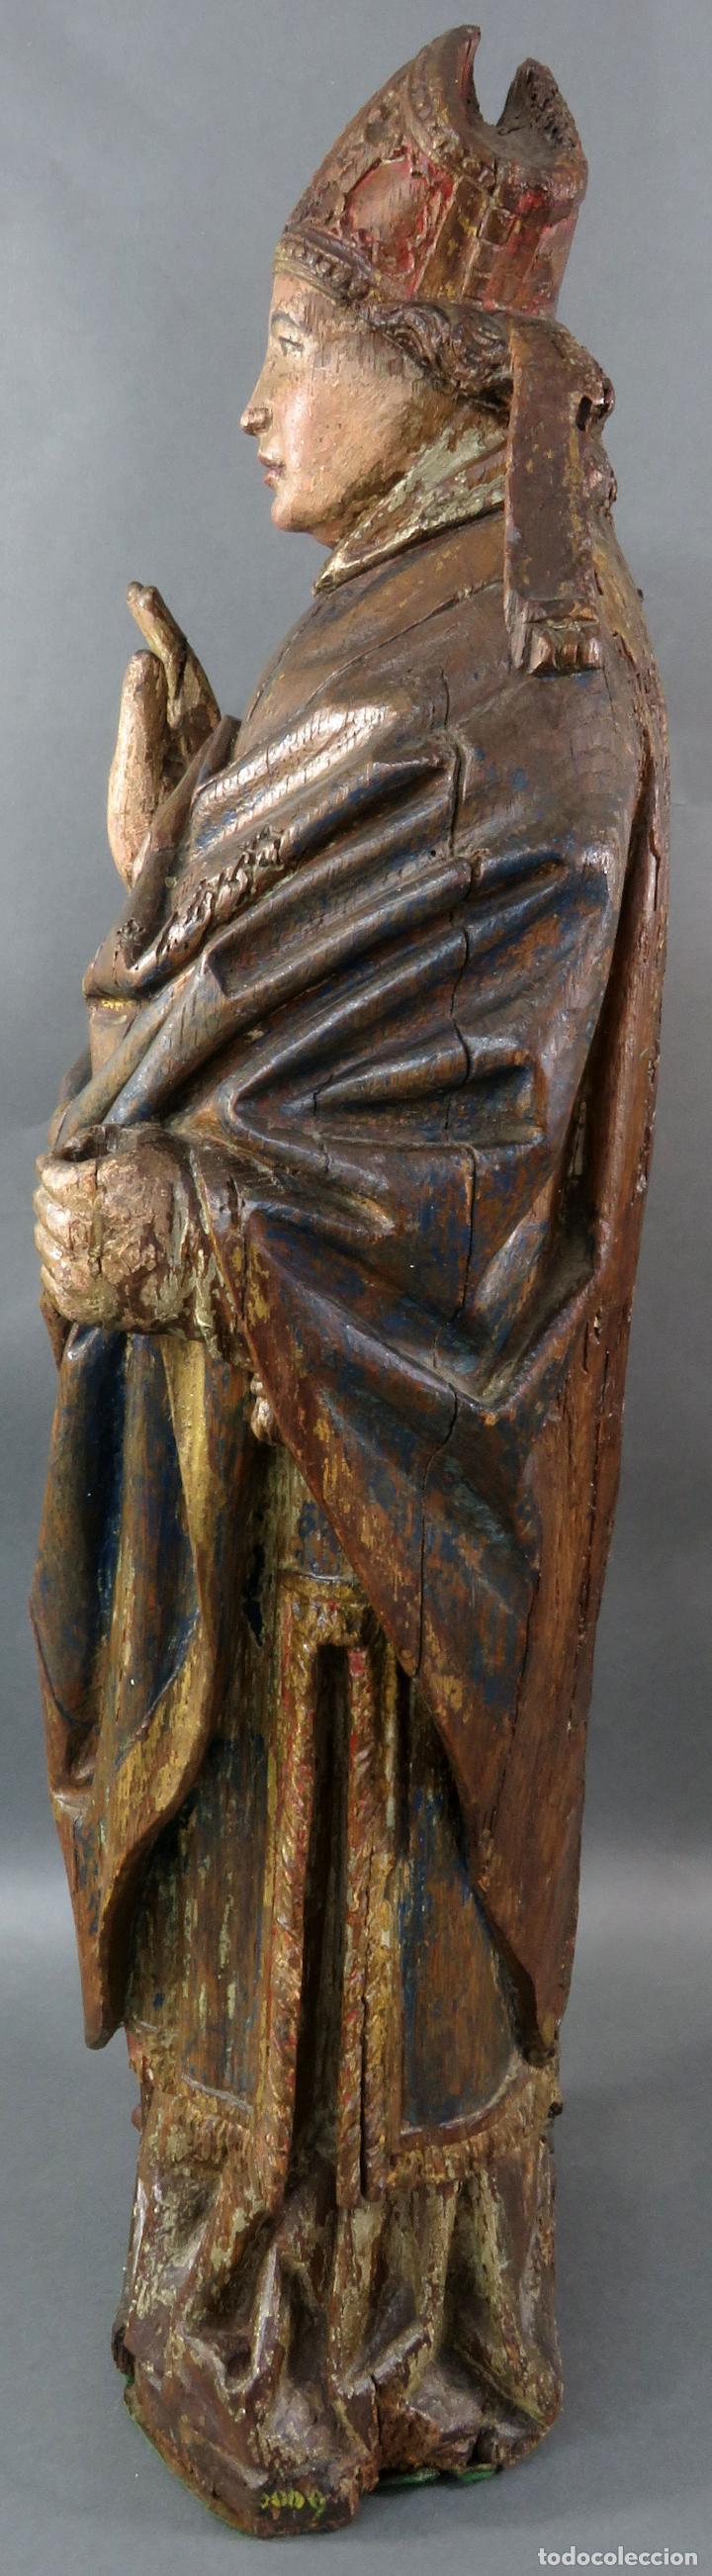 Arte: Talla obispo bendiciendo en madera tallada policromada circulo Alejo de Baiha principios siglo XVI - Foto 17 - 194787992